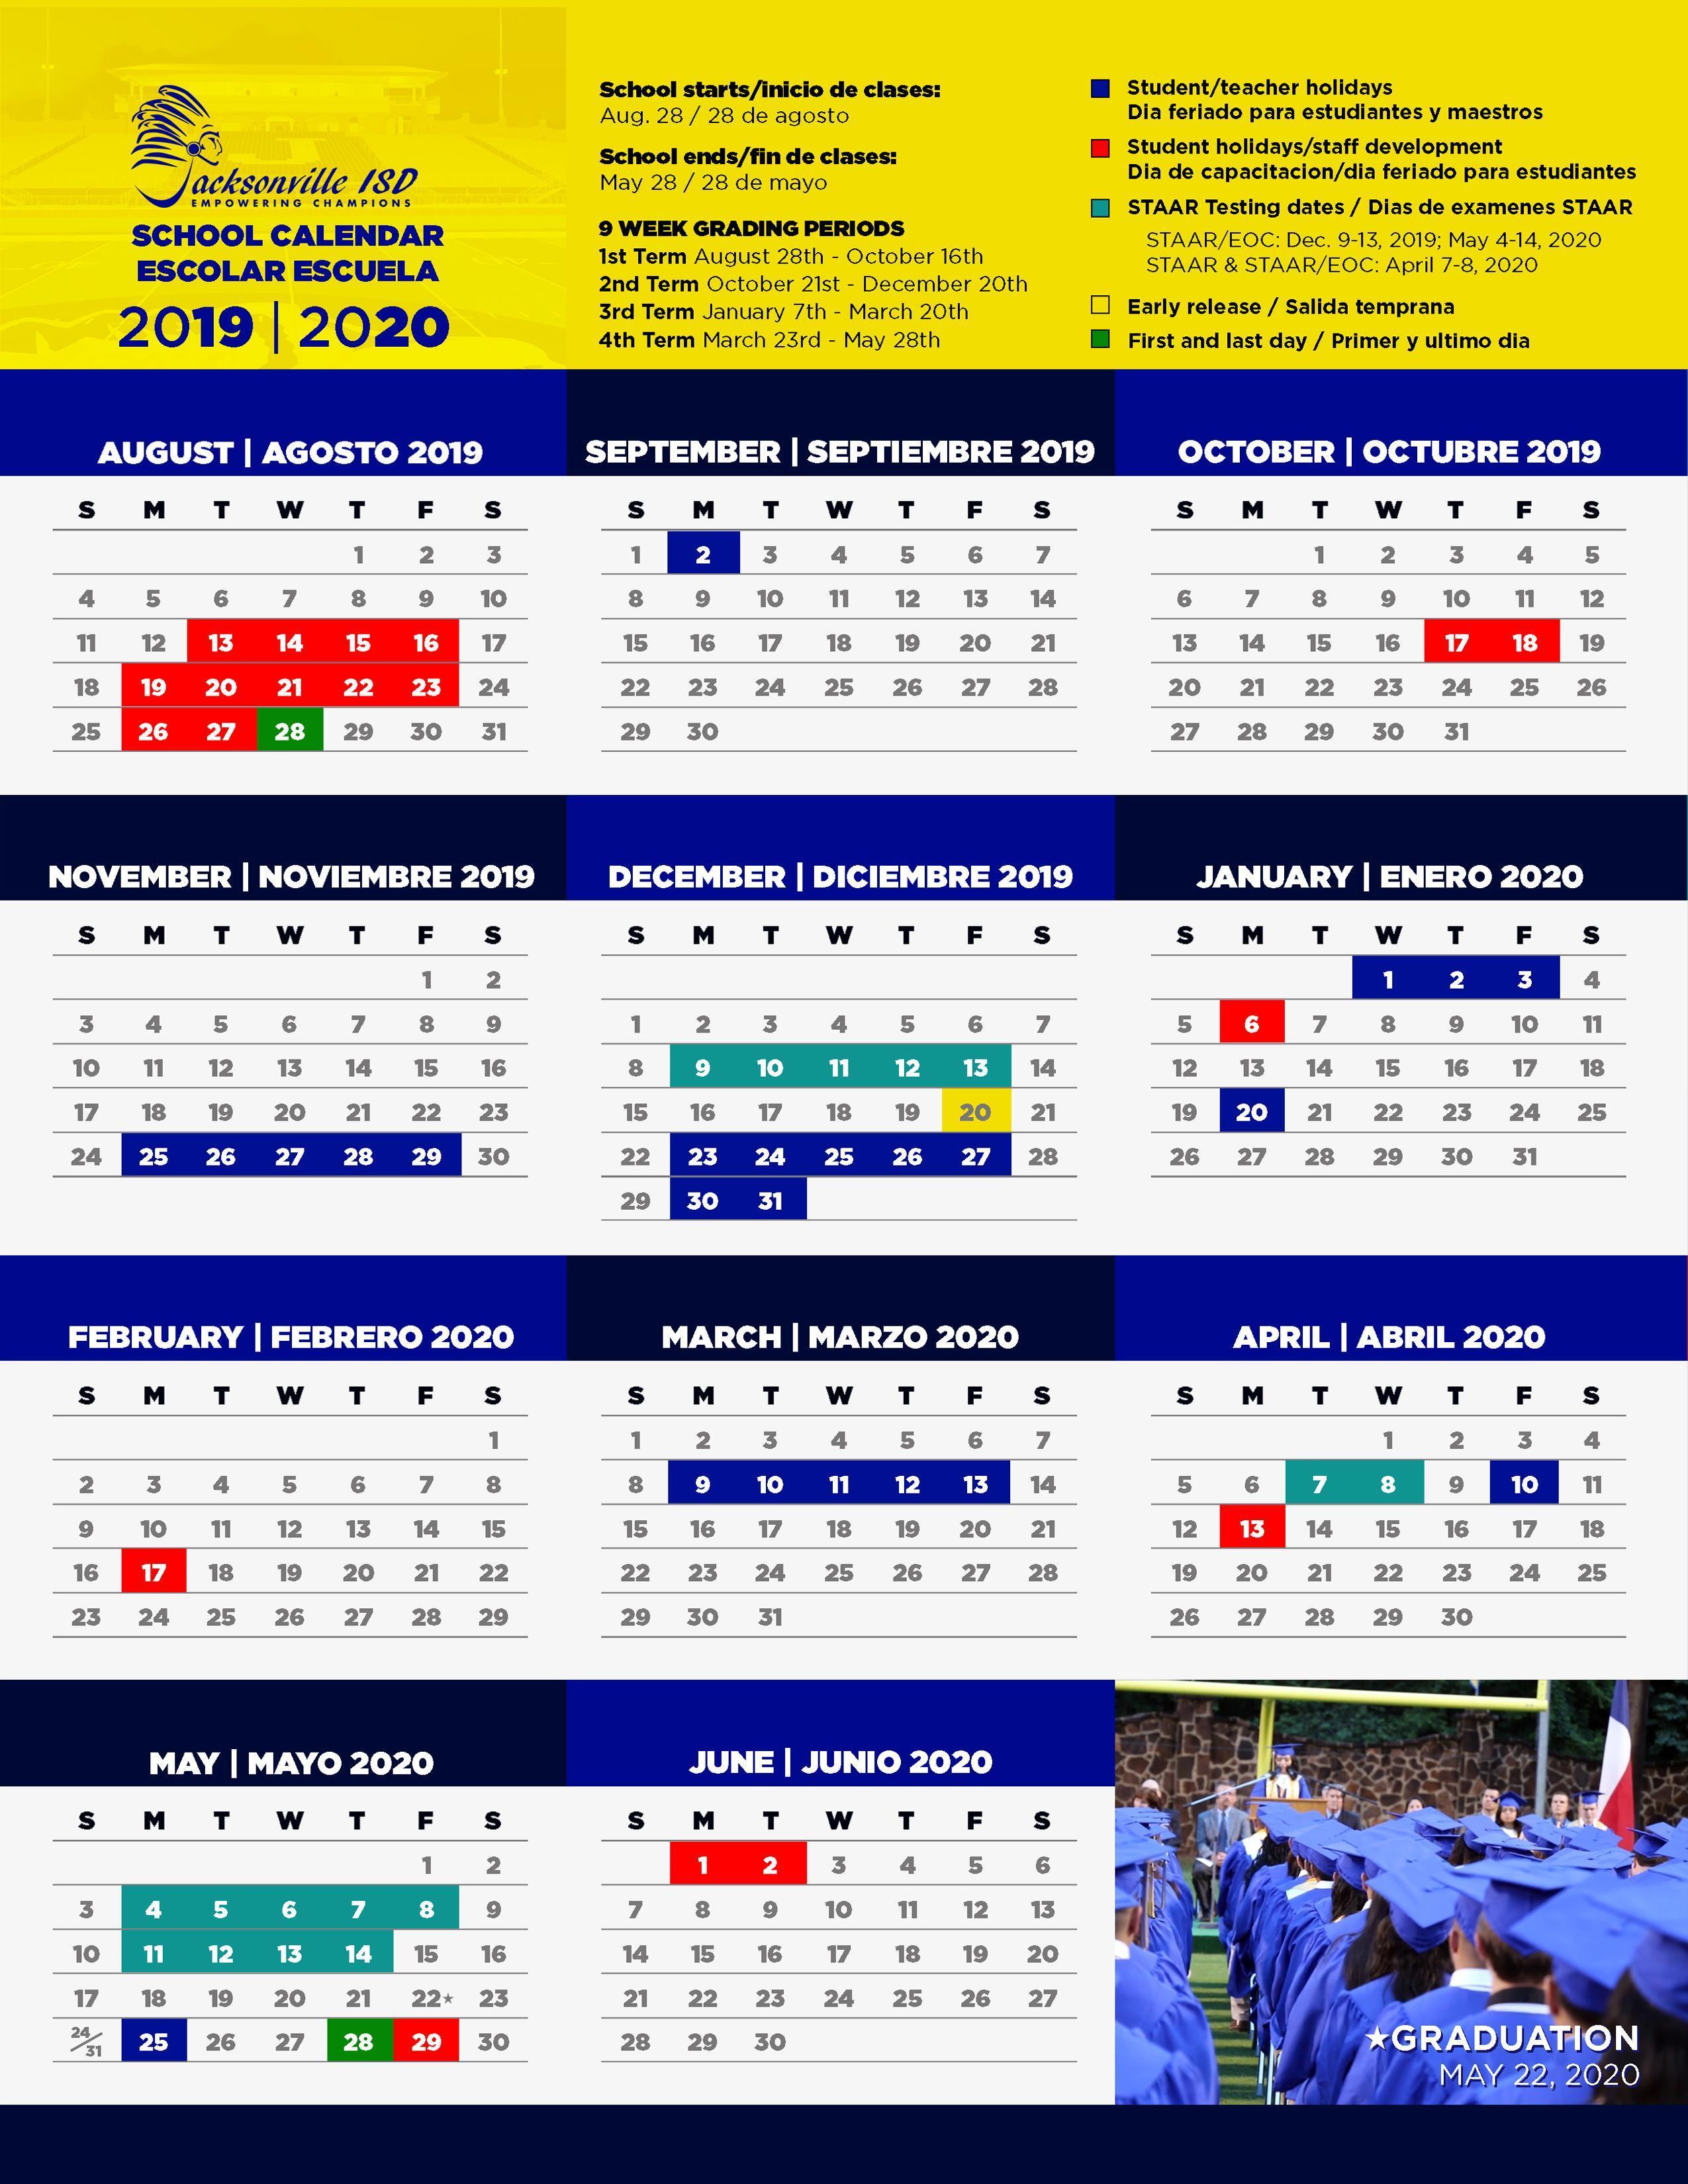 image of 2019-20 school calendar